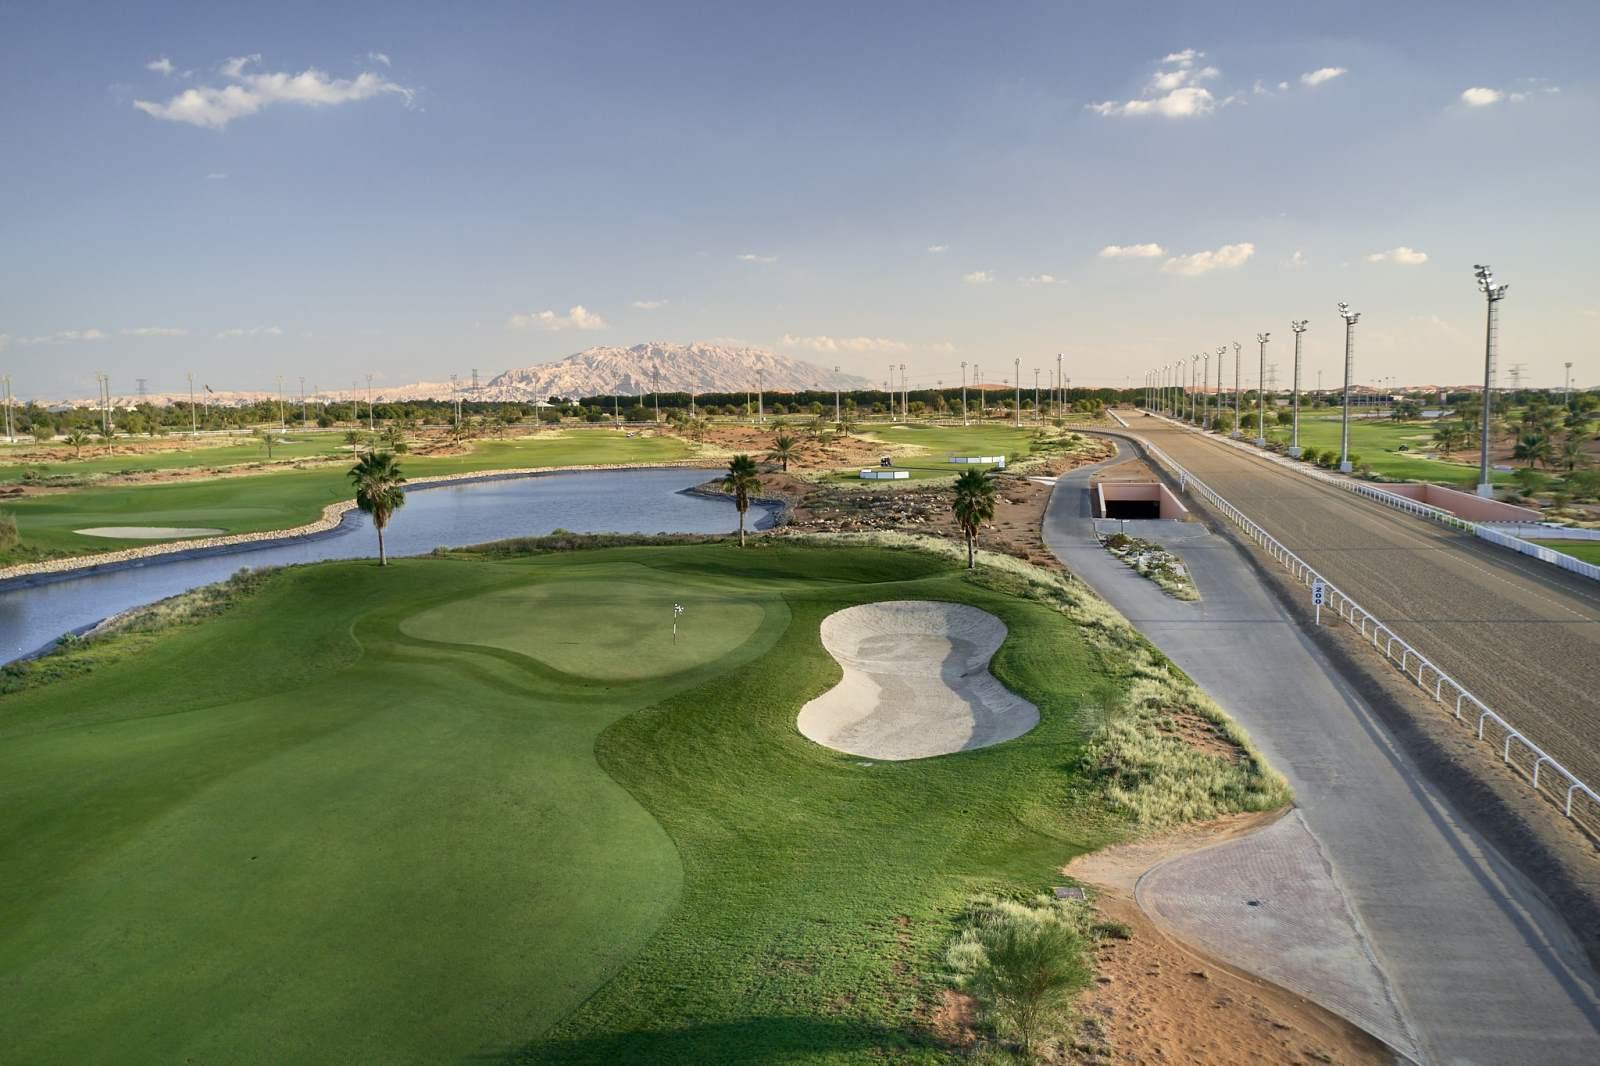 Faldo Series Europemod Grand Final venue Al Ain Equestrian, Shooting & Golf Club